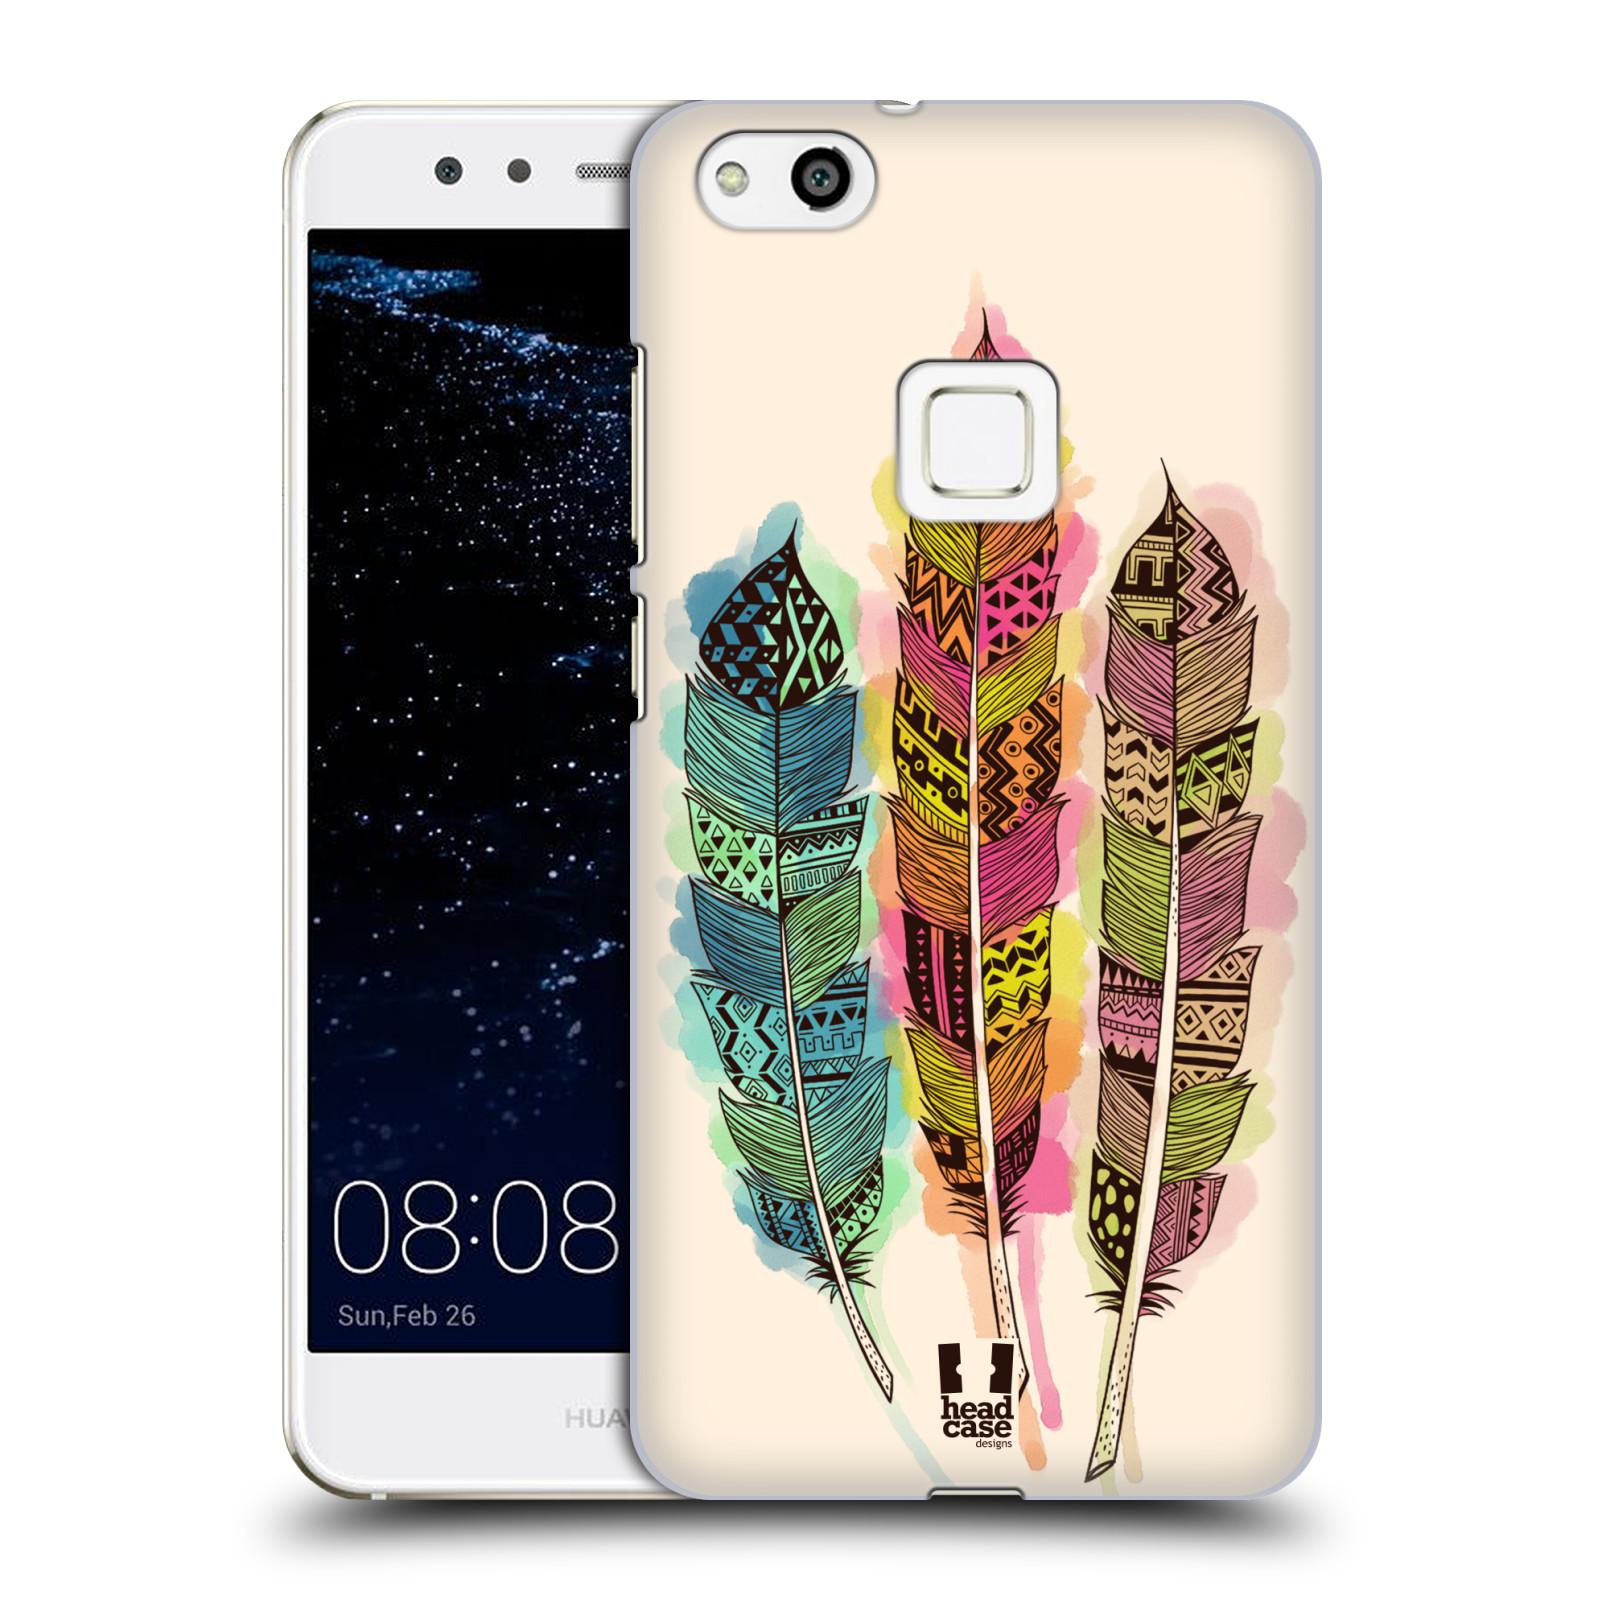 Plastové pouzdro na mobil Huawei P10 Lite Head Case - AZTEC PÍRKA SPLASH (Plastový kryt či obal na mobilní telefon Huawei P10 Lite Dual SIM (LX1/LX1A))